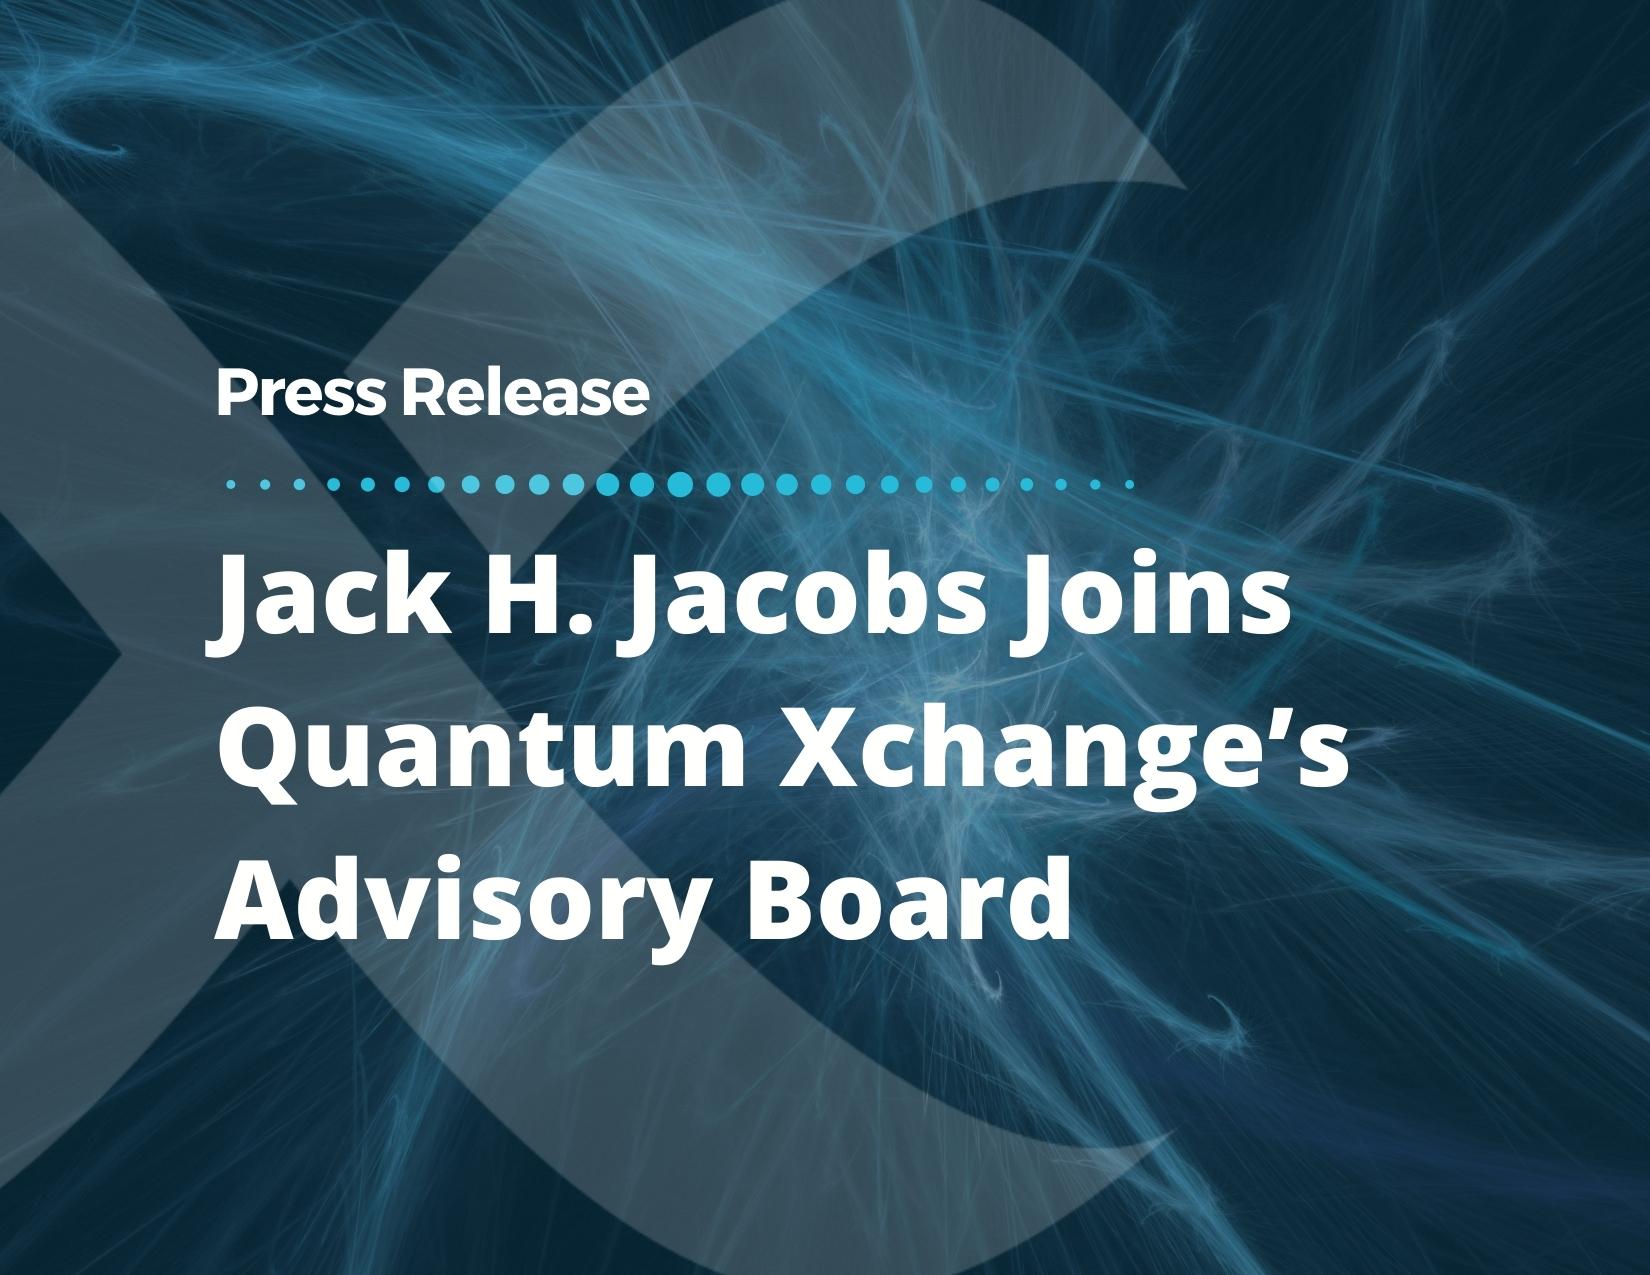 Jack H. Jacobs Joins Quantum Xchange's Advisory Board